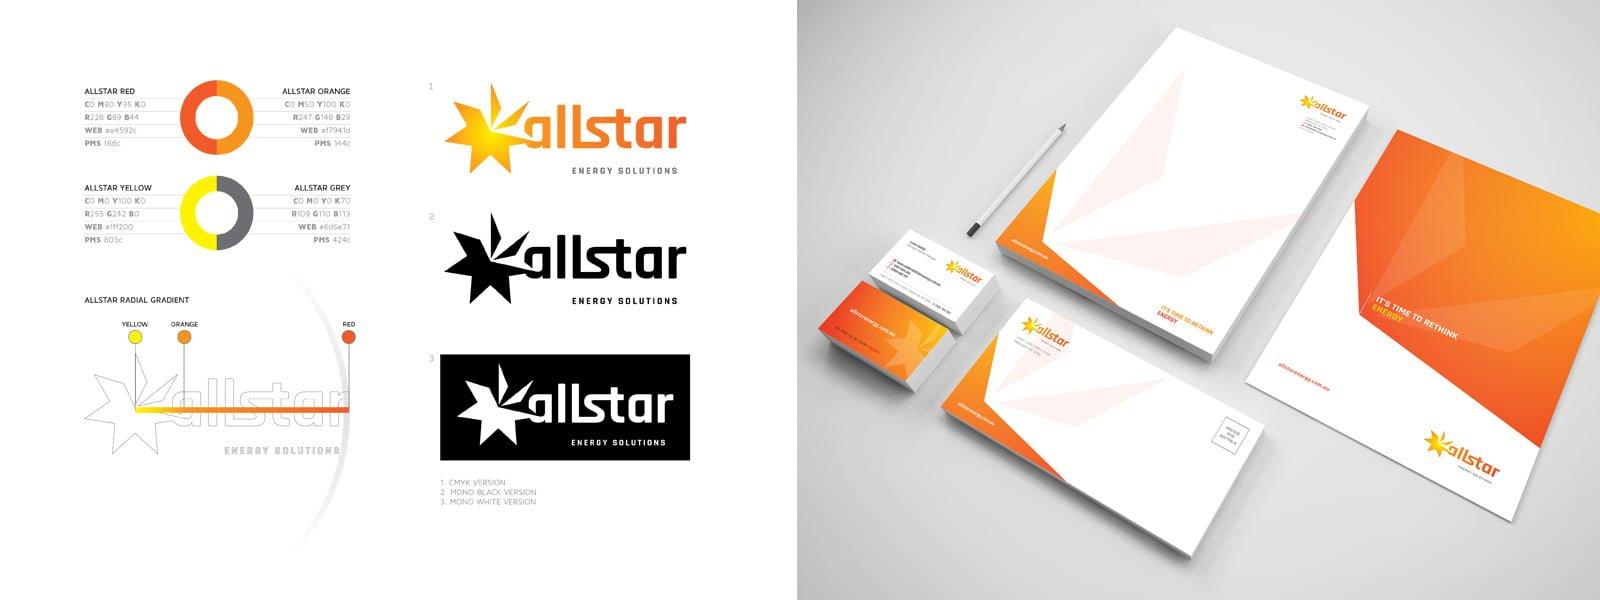 Allstar Energy New Brand by Zephyrmedia